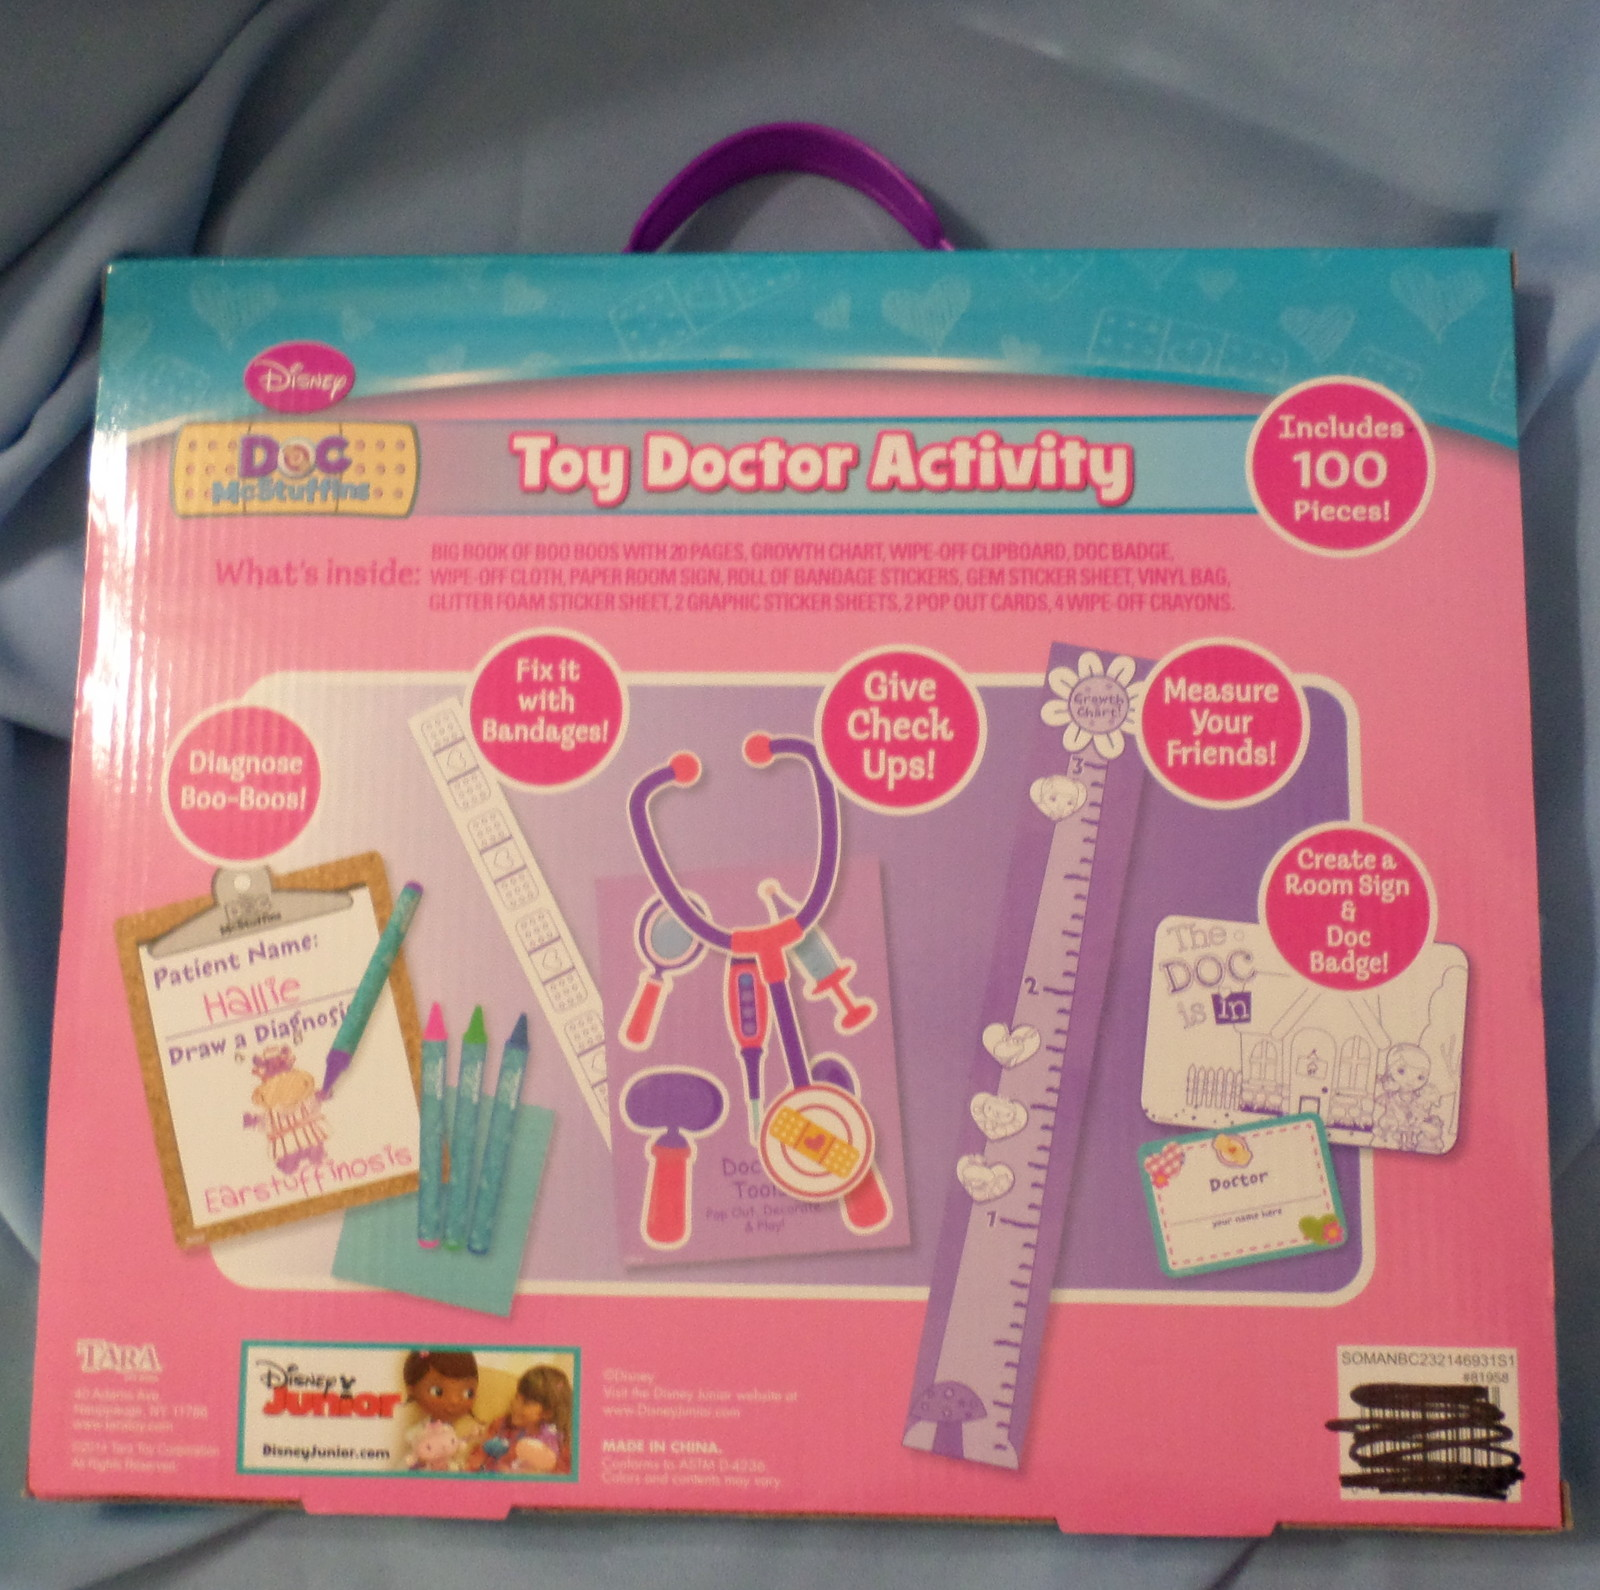 Disney Doc McStuffins Toy Doctor Activity Kit 2014 unisex age 3+ play set H27